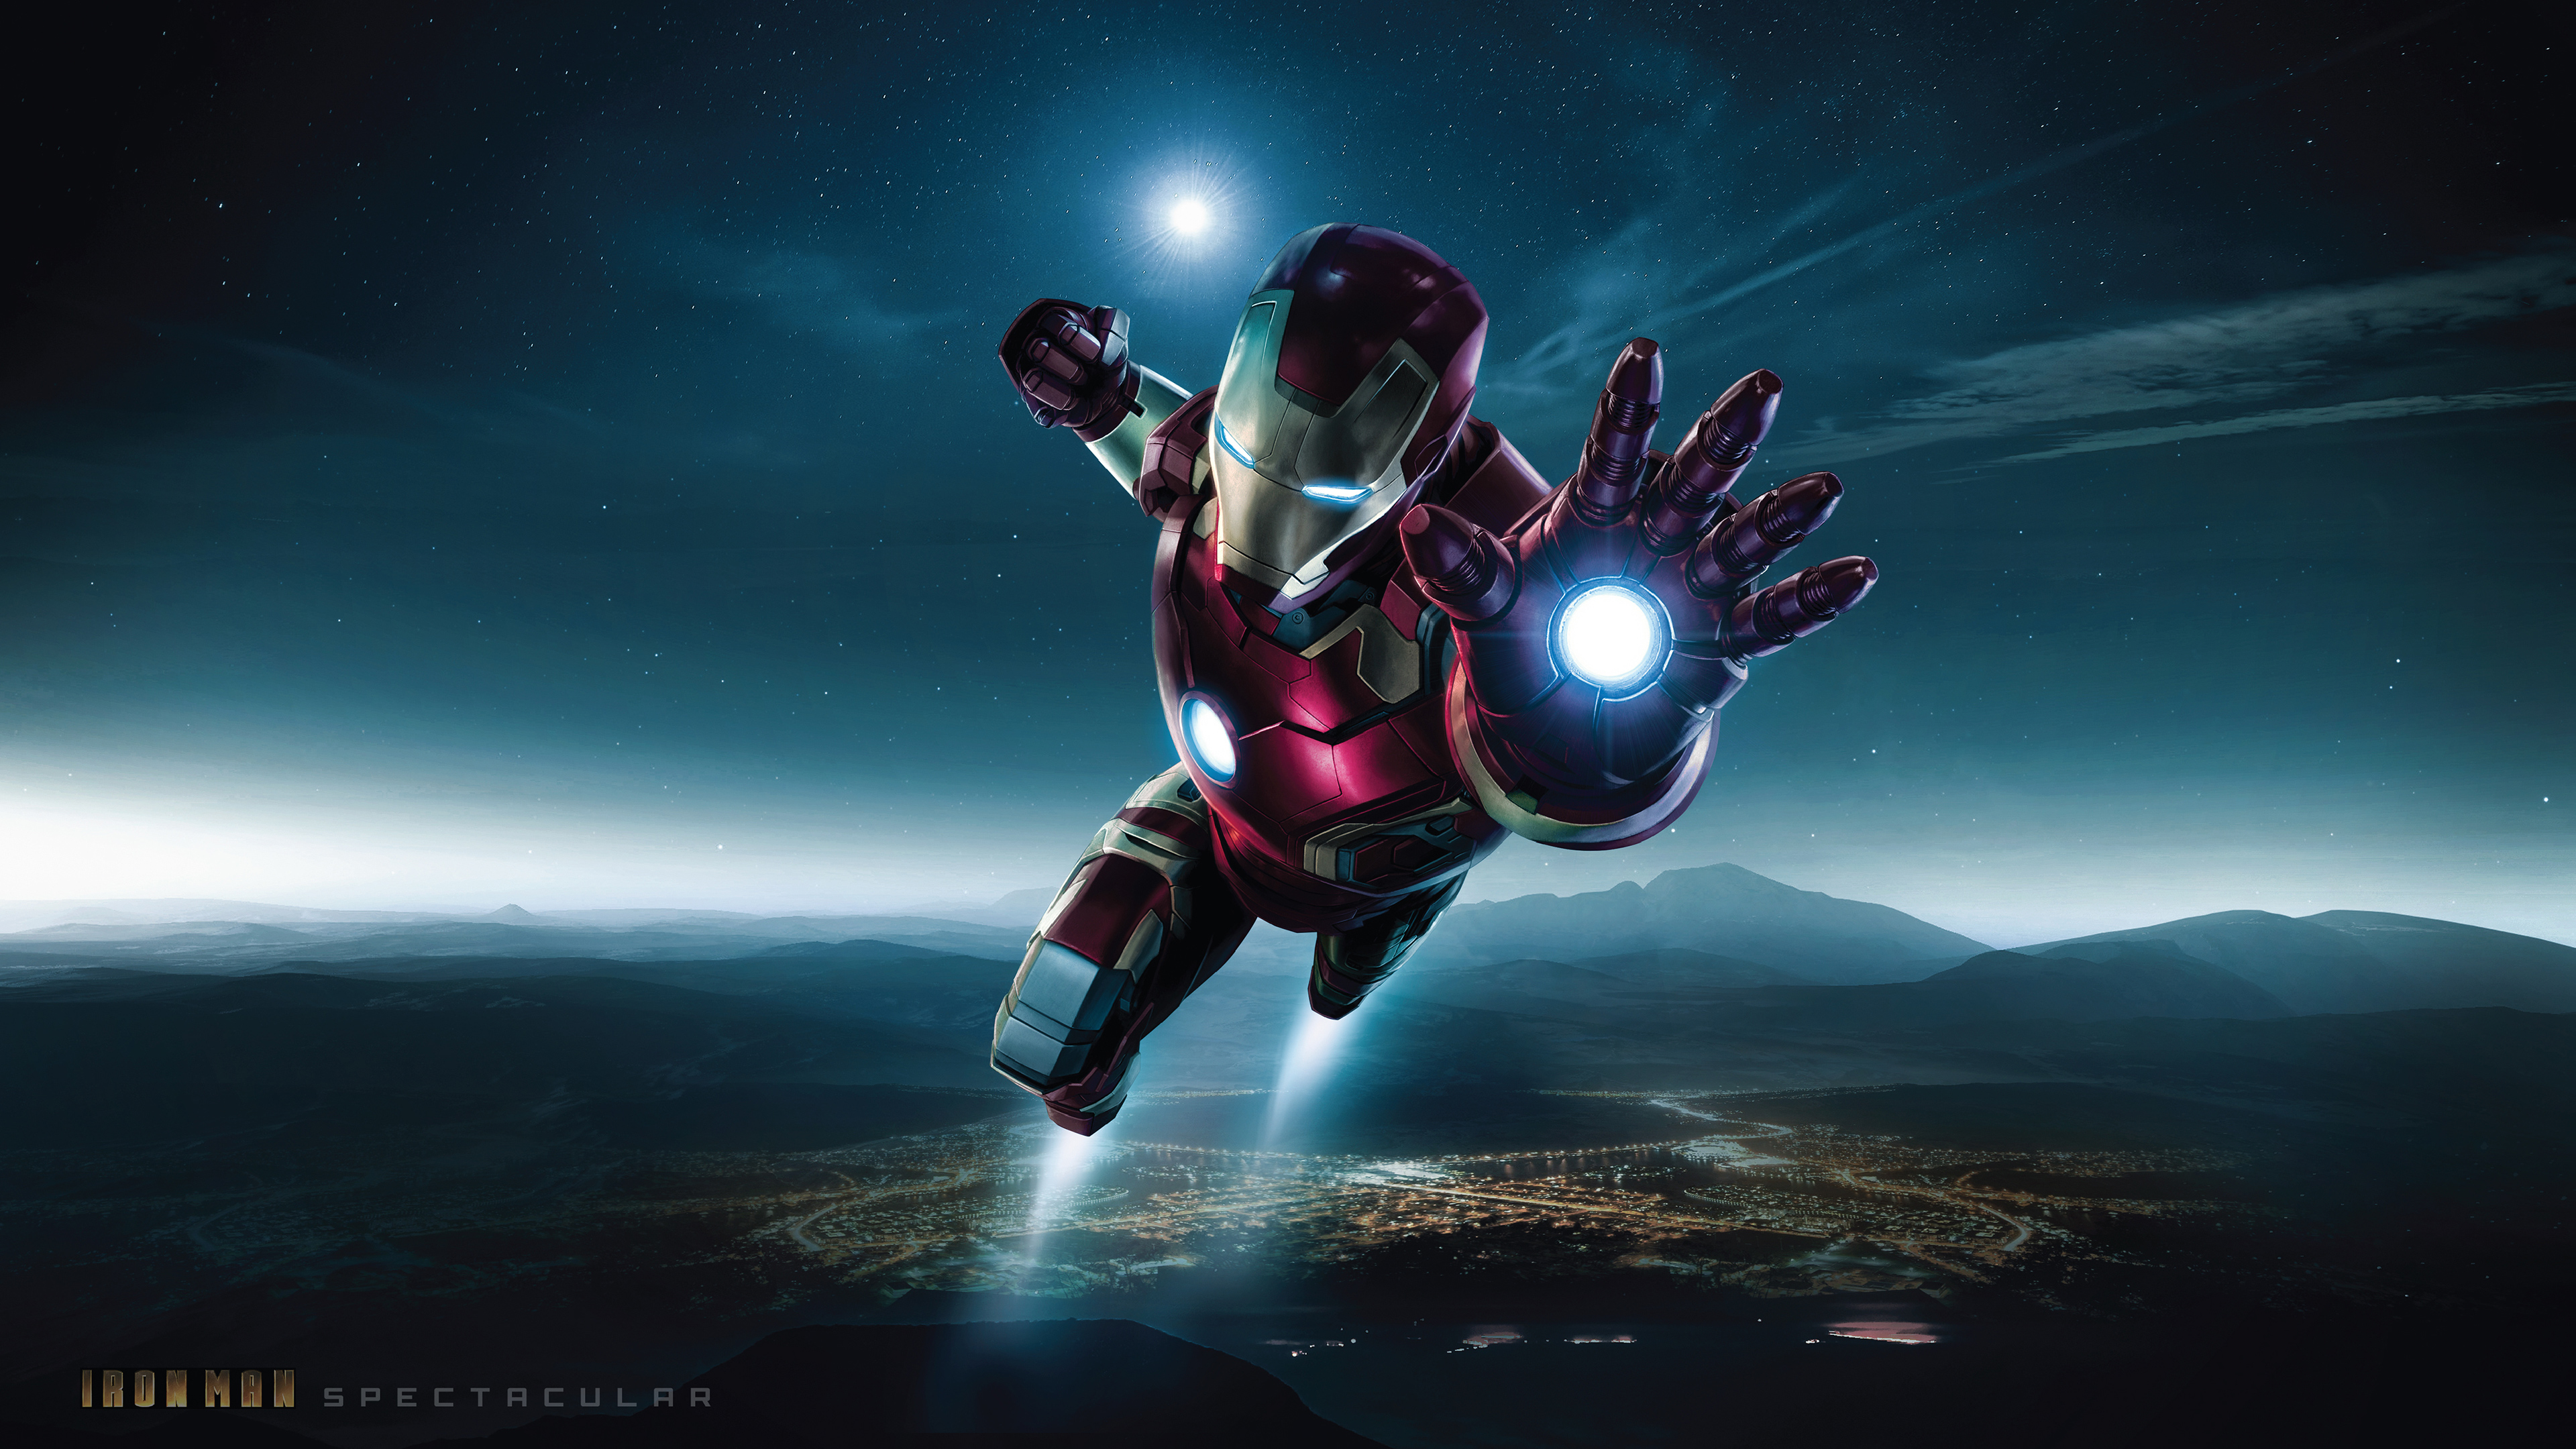 Wallpaper 4k Spectacular Iron Man 4k 4k Wallpapers Artist